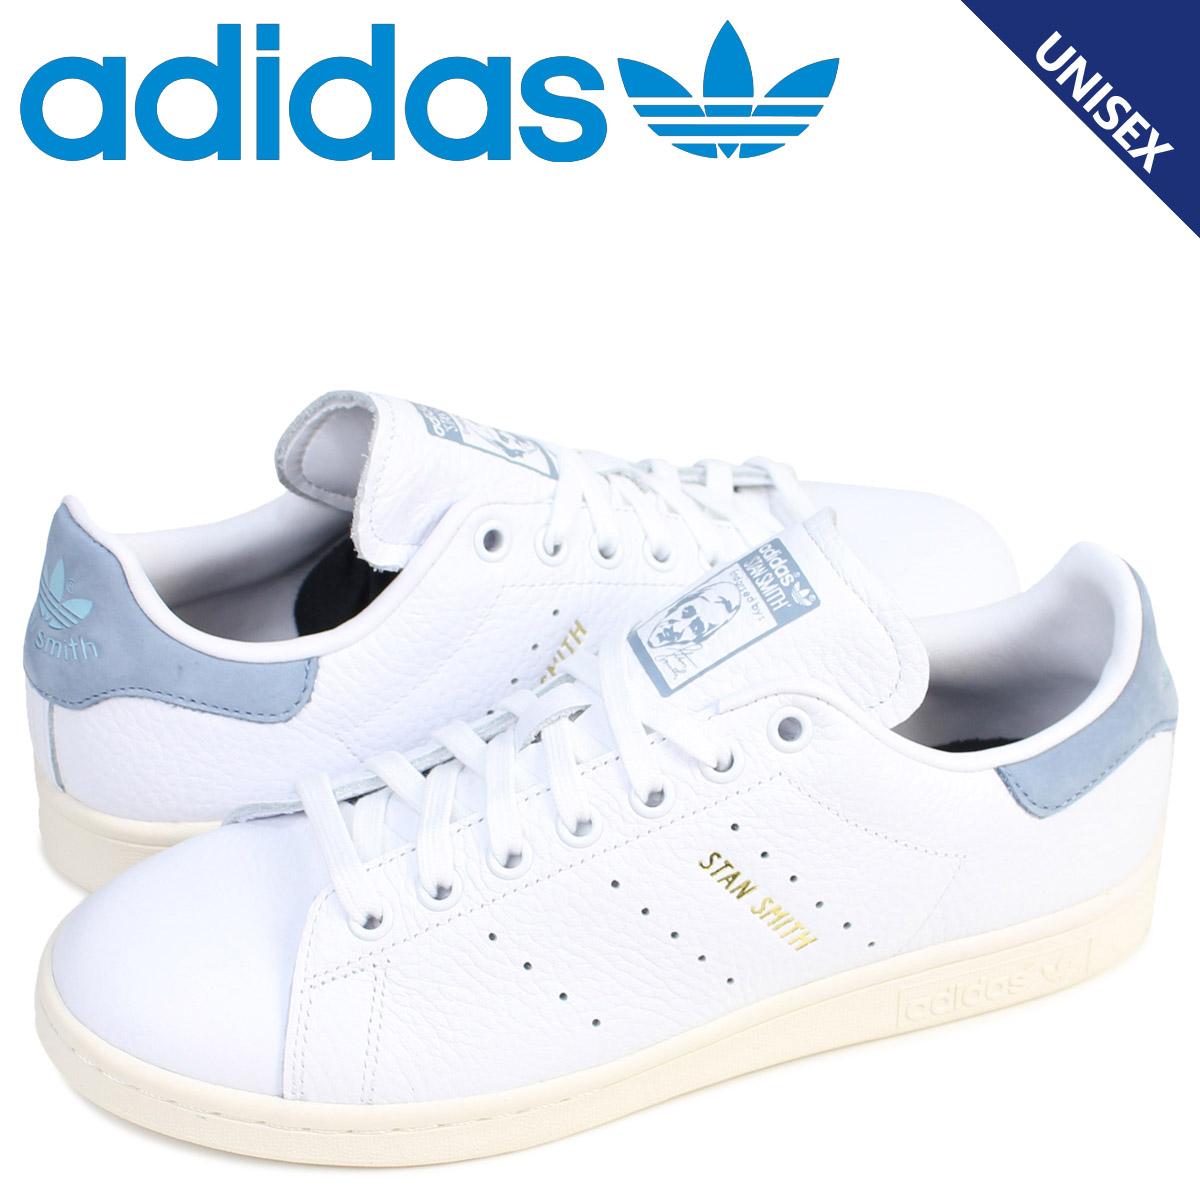 adidas stan smith Return CHRISTMAS Adidas Arrival Top Schuhe